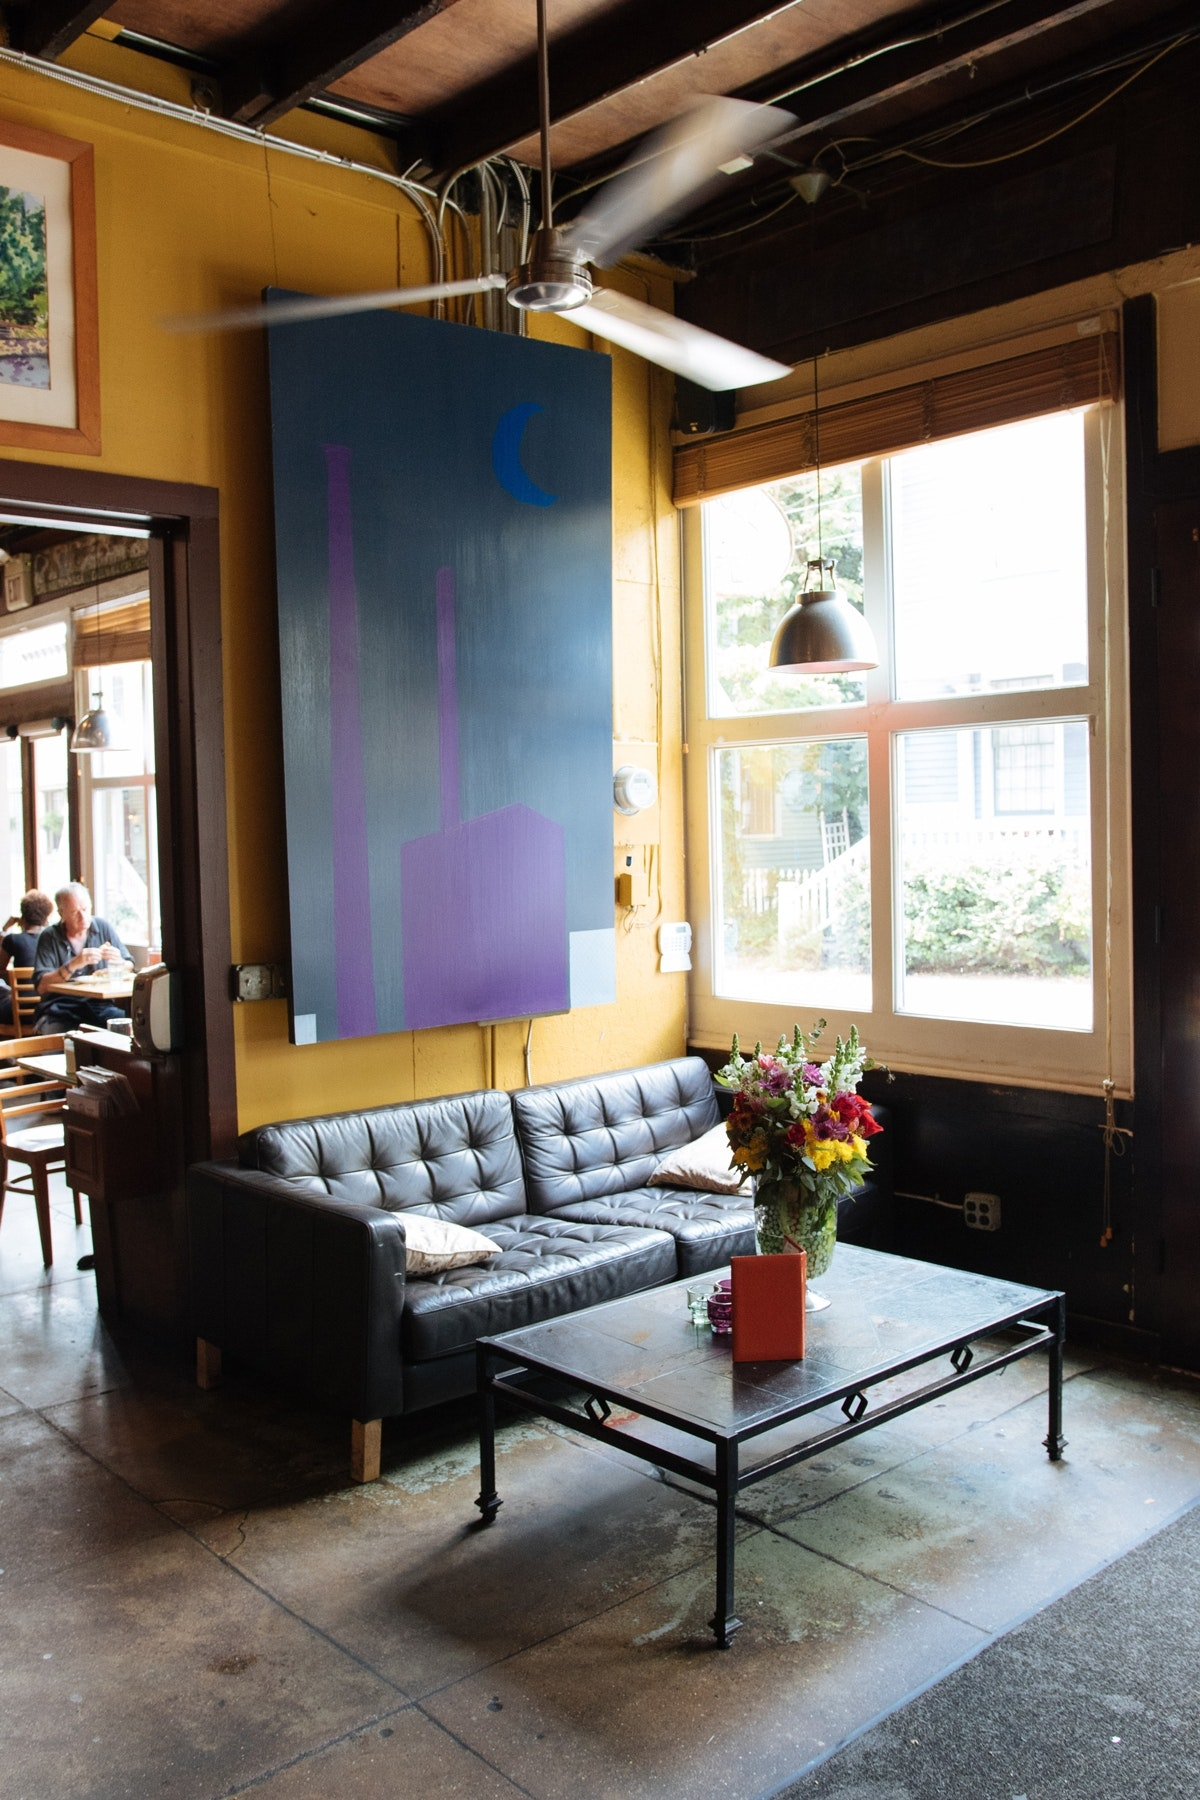 Carroll Street Cafe